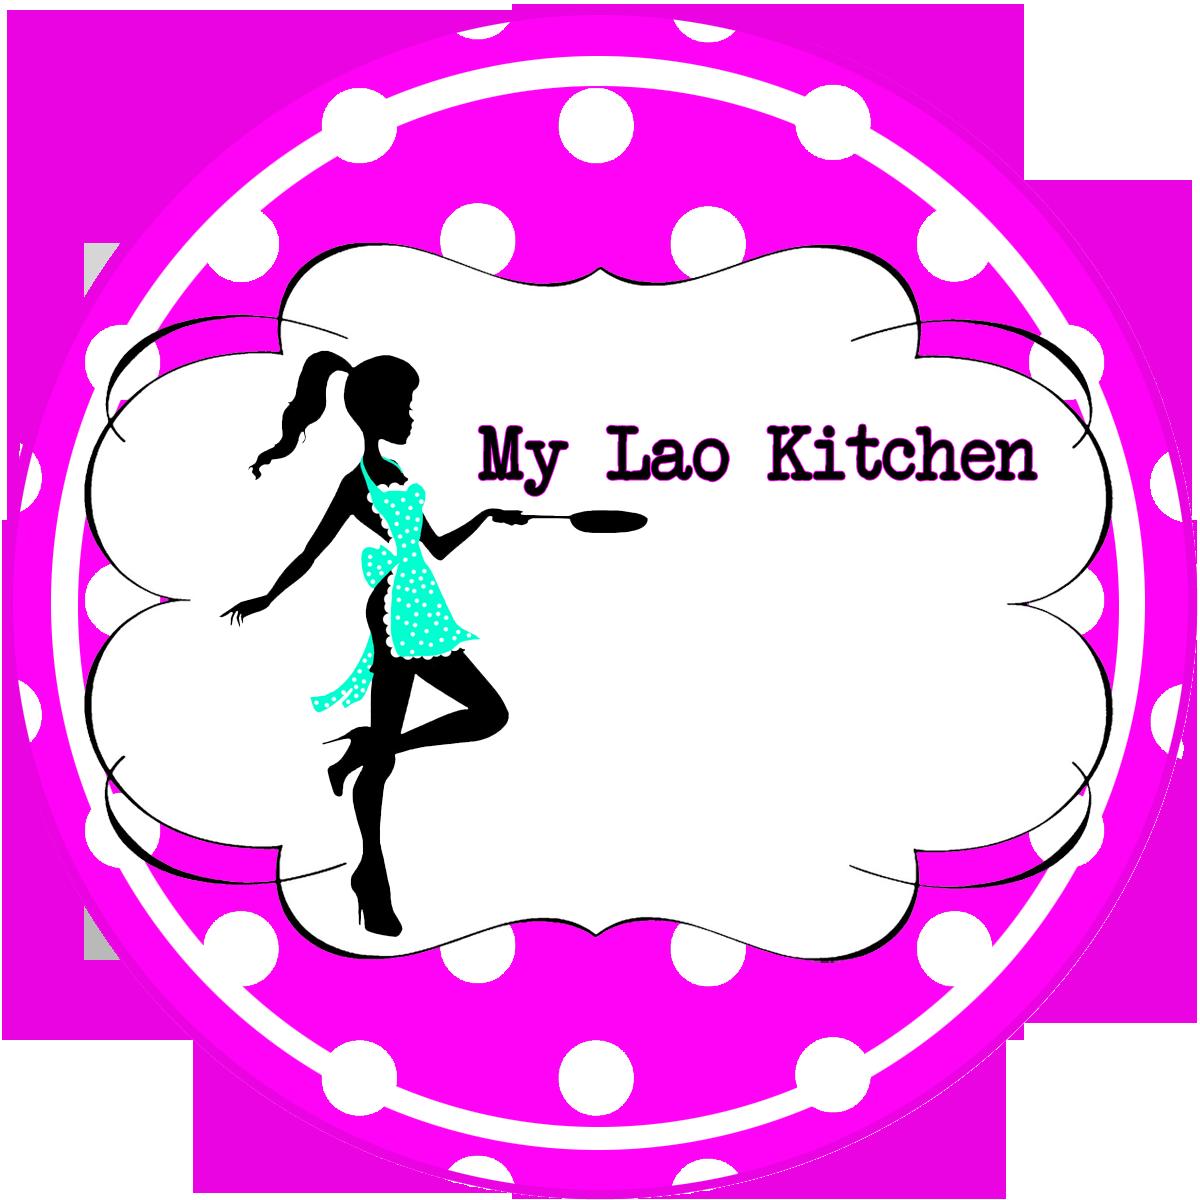 My Lao Kitchen